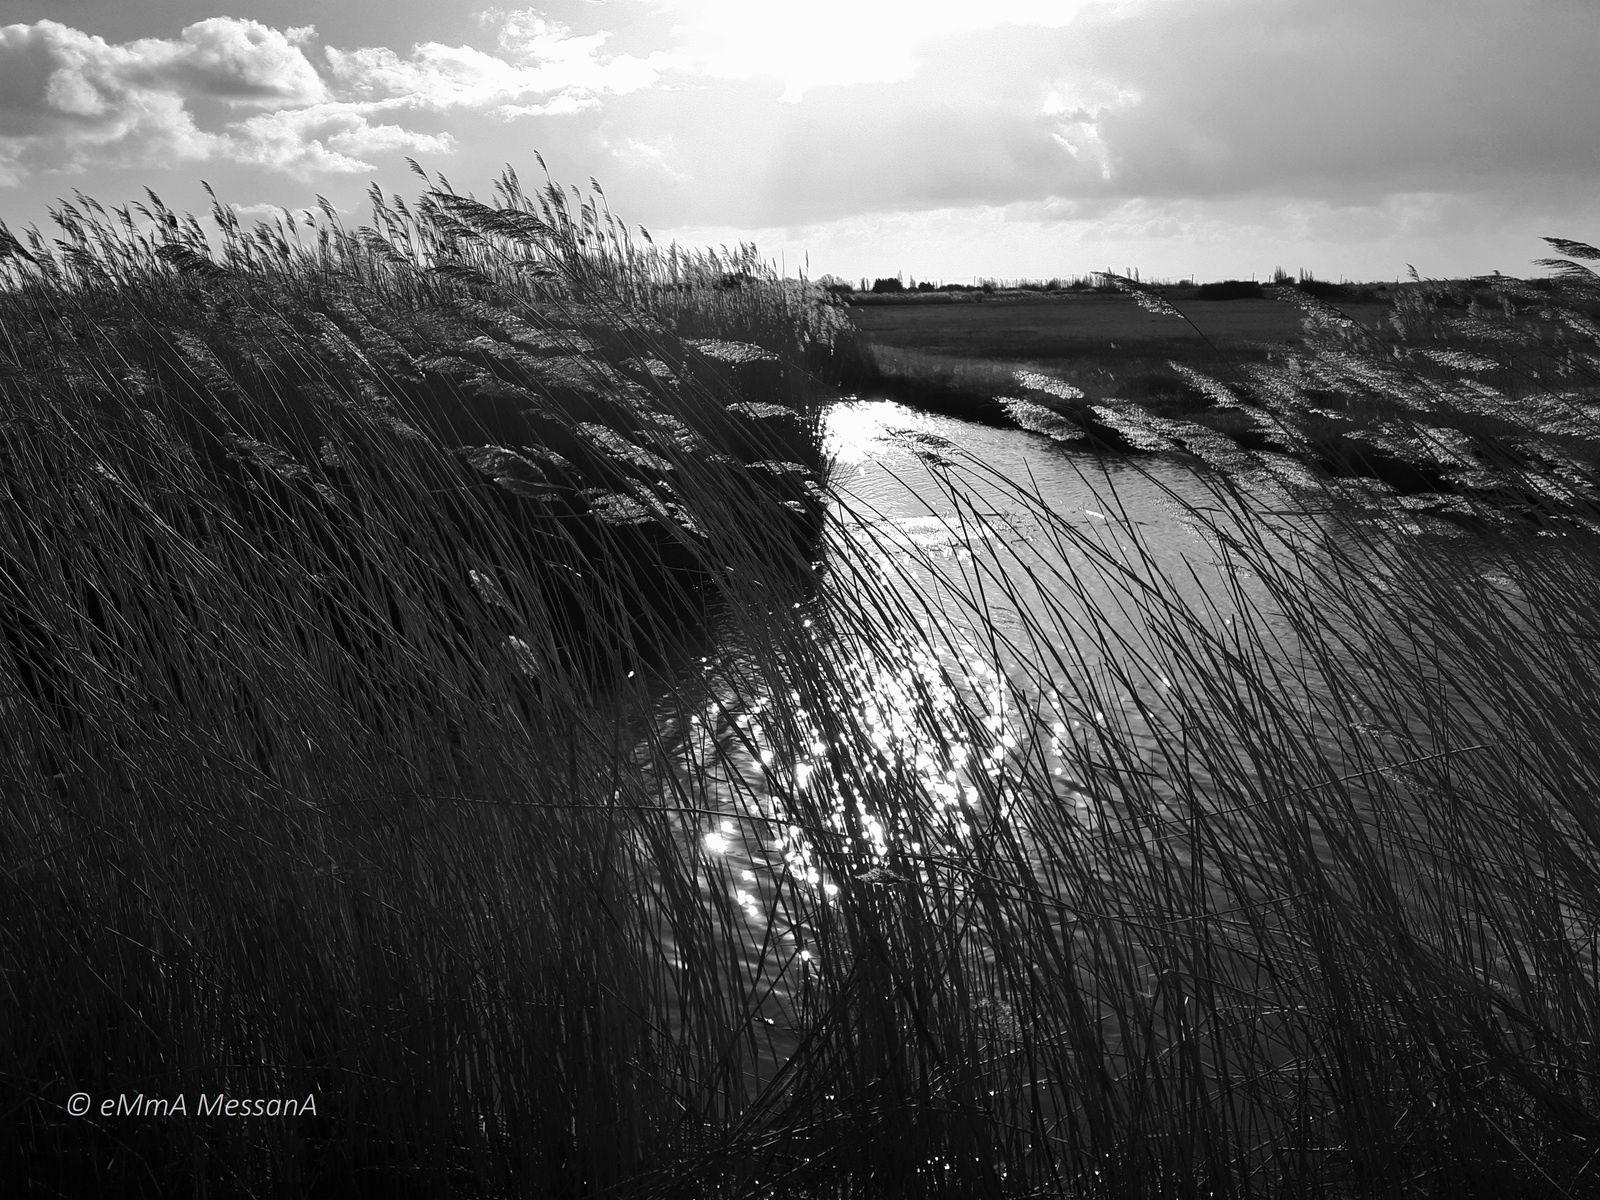 Saint-Urbain (Vendée), impression 4 du marais 27 janvier 2019 © eMmA MessanA